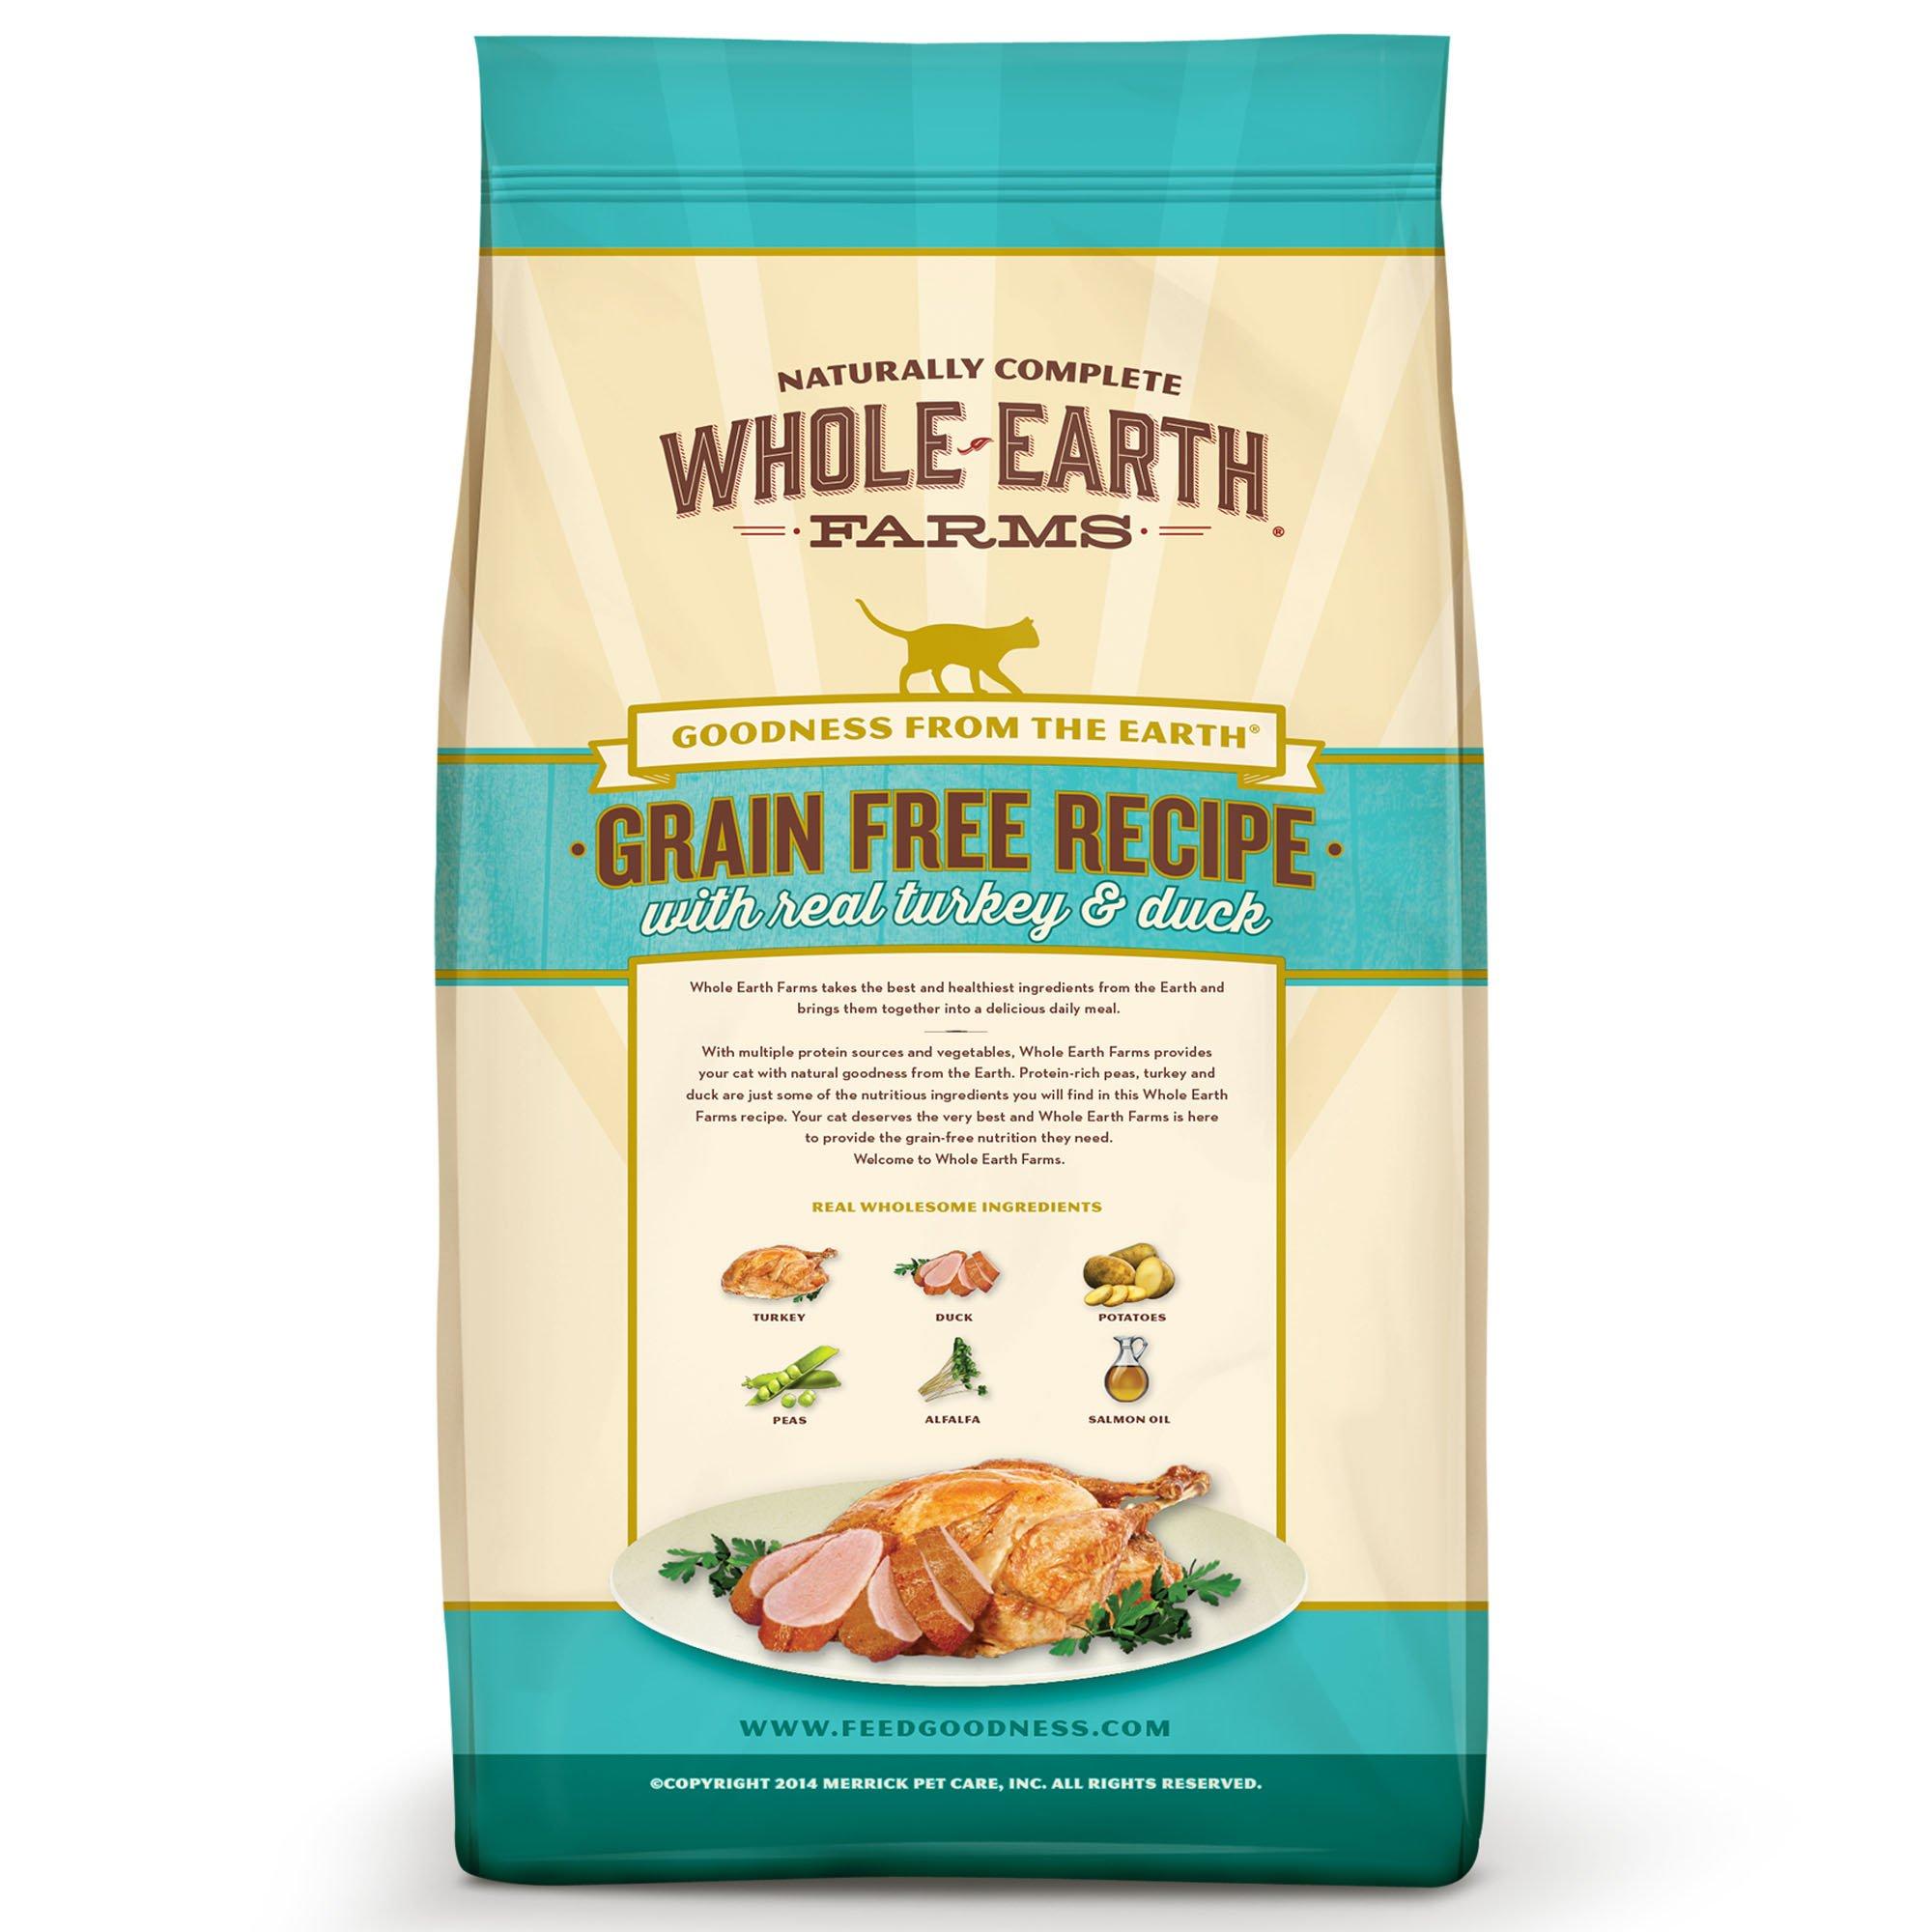 Whole-Earth-Farms-Grain-Free-Real-Turkey-amp-Duck-Cat-Food thumbnail 3